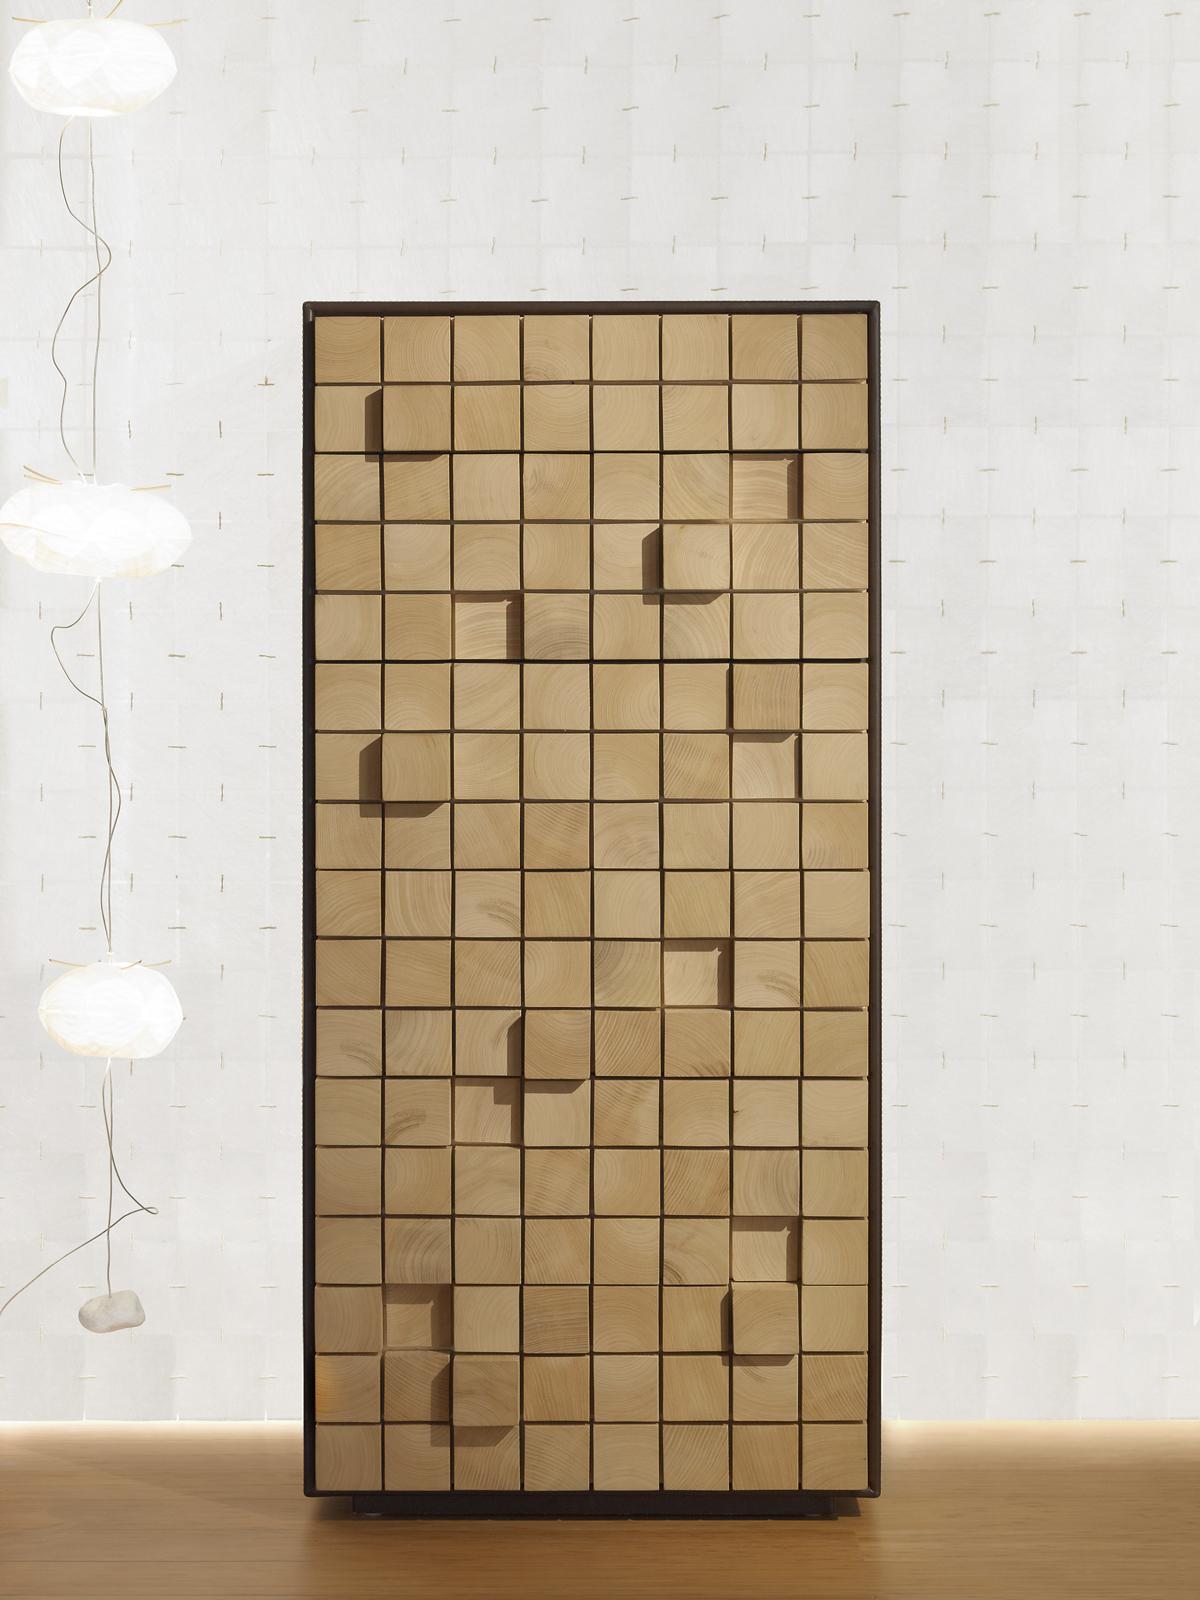 chiffonier-bois-recouvert-cuir-8-tiroirs-parfait-rangement-chambre